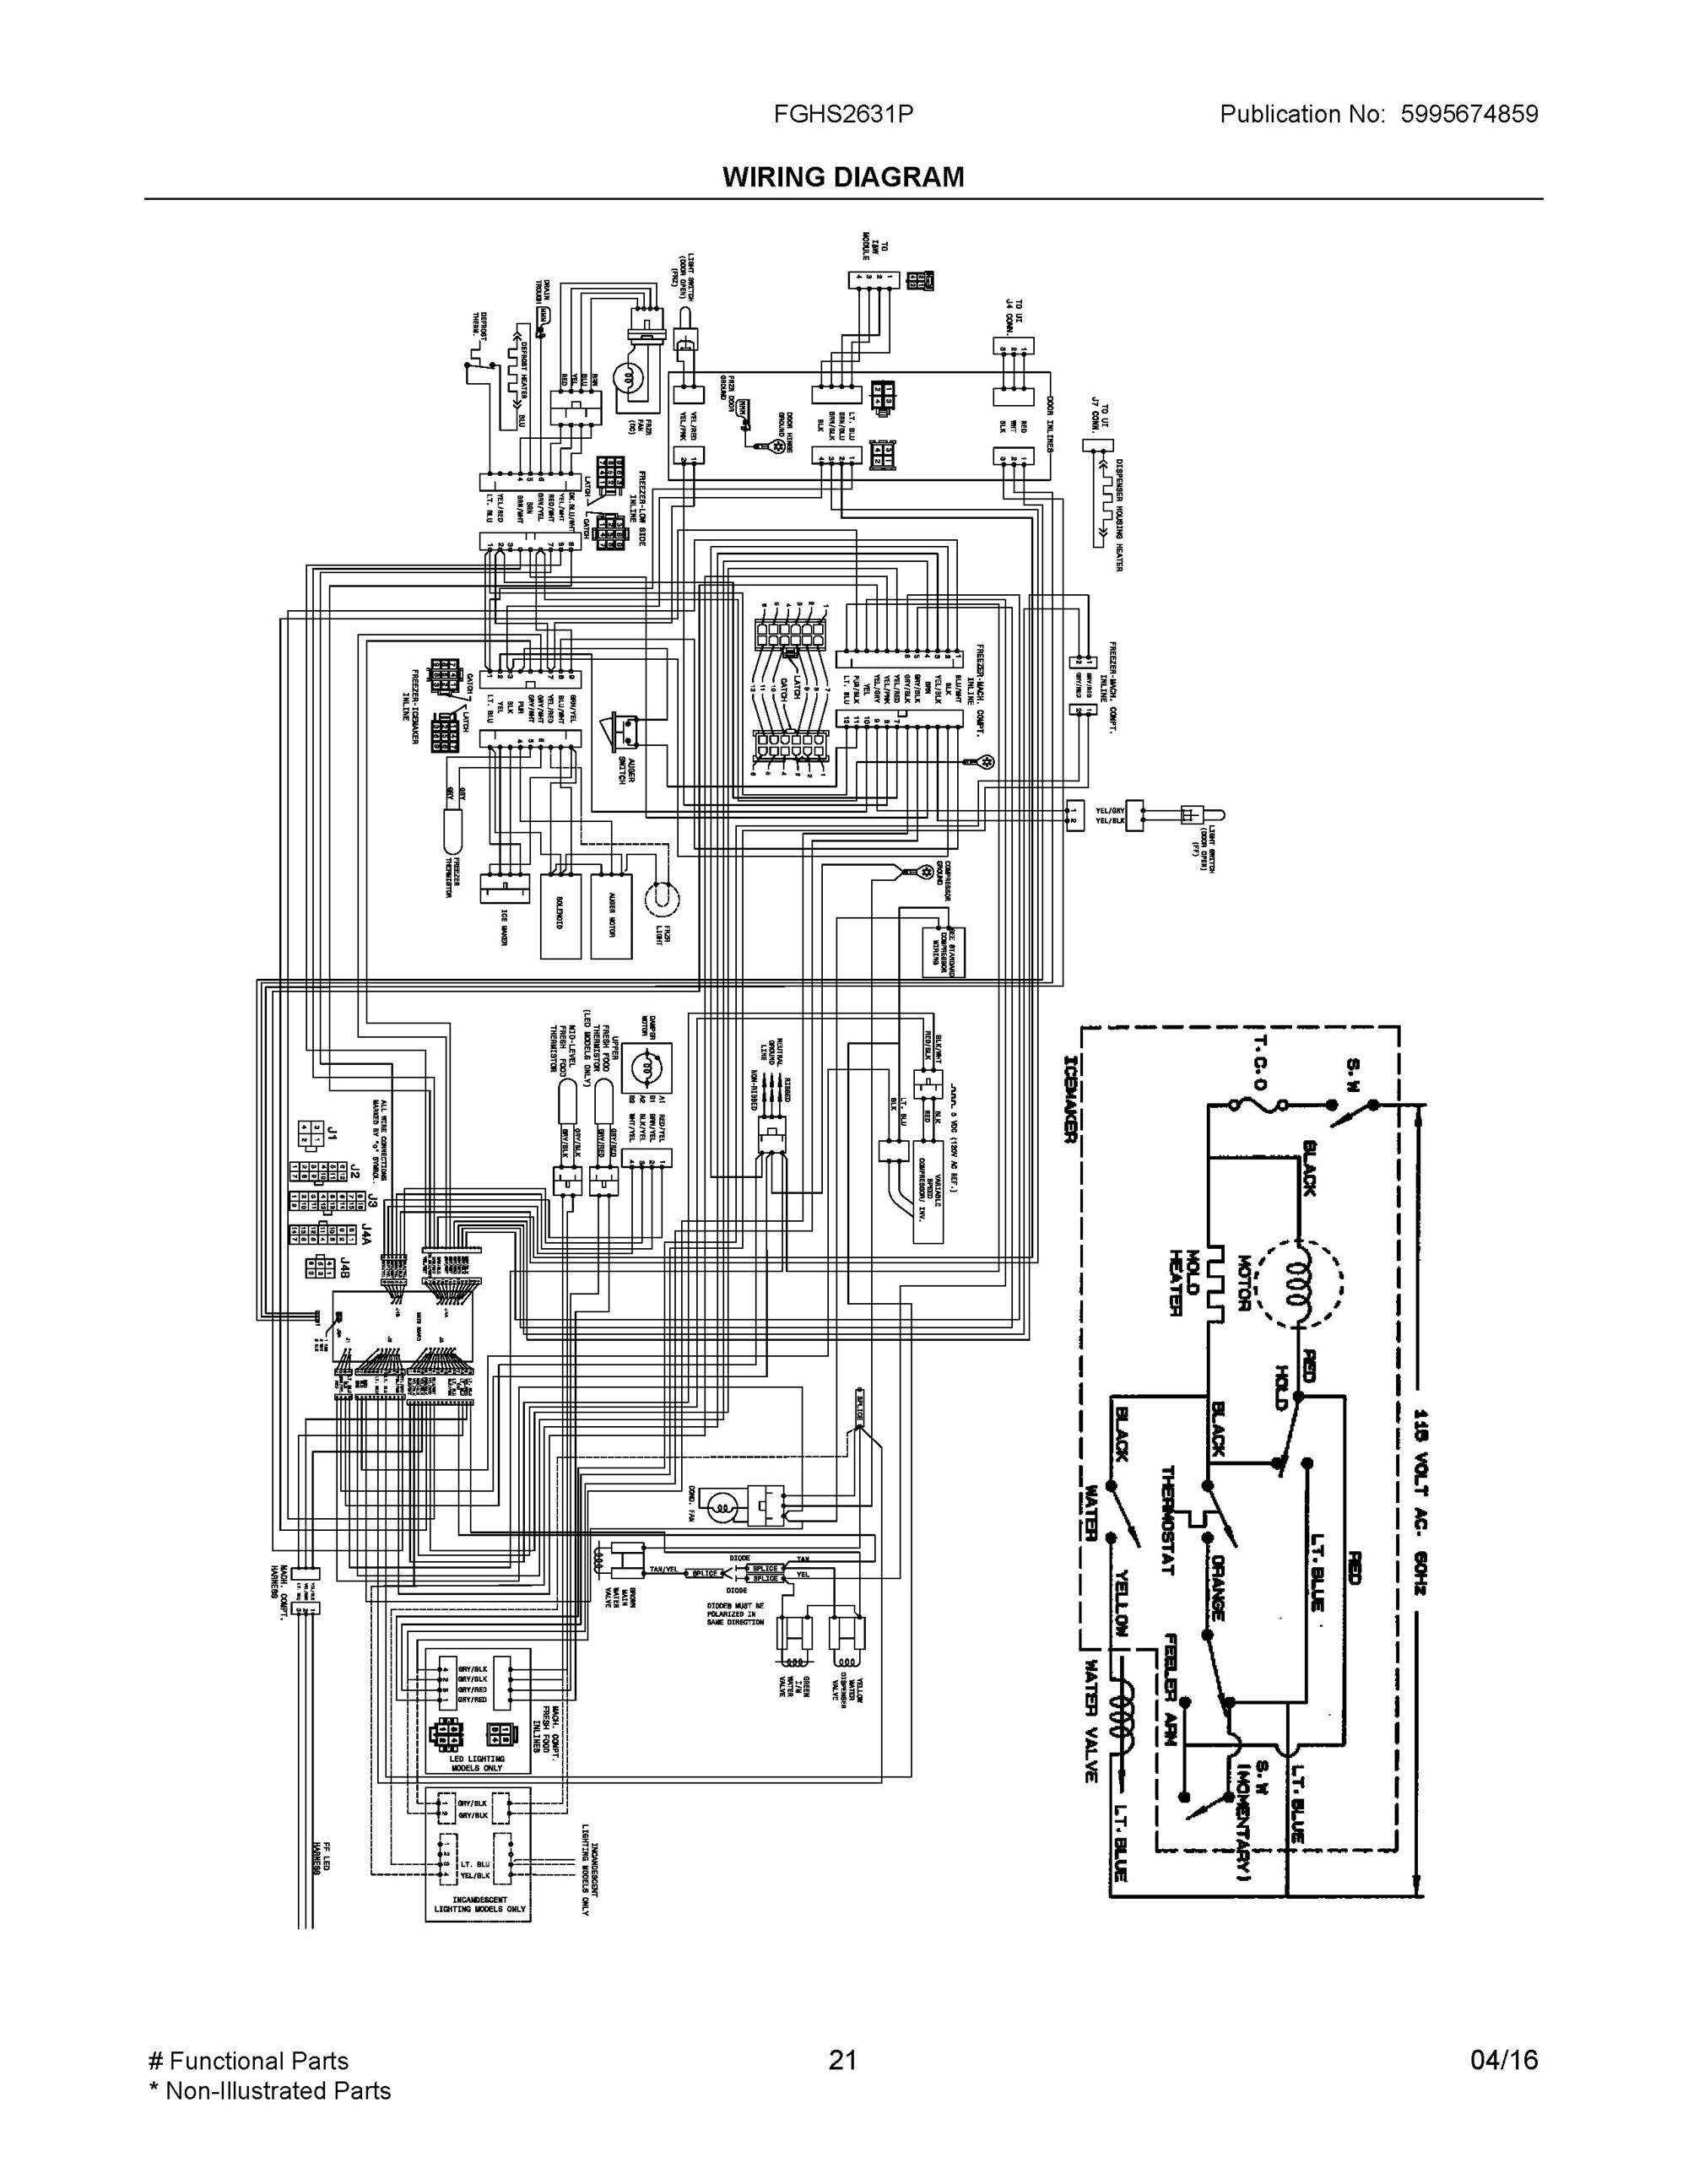 Frigidaire Dehumidifier Wiring Diagram Honeywell